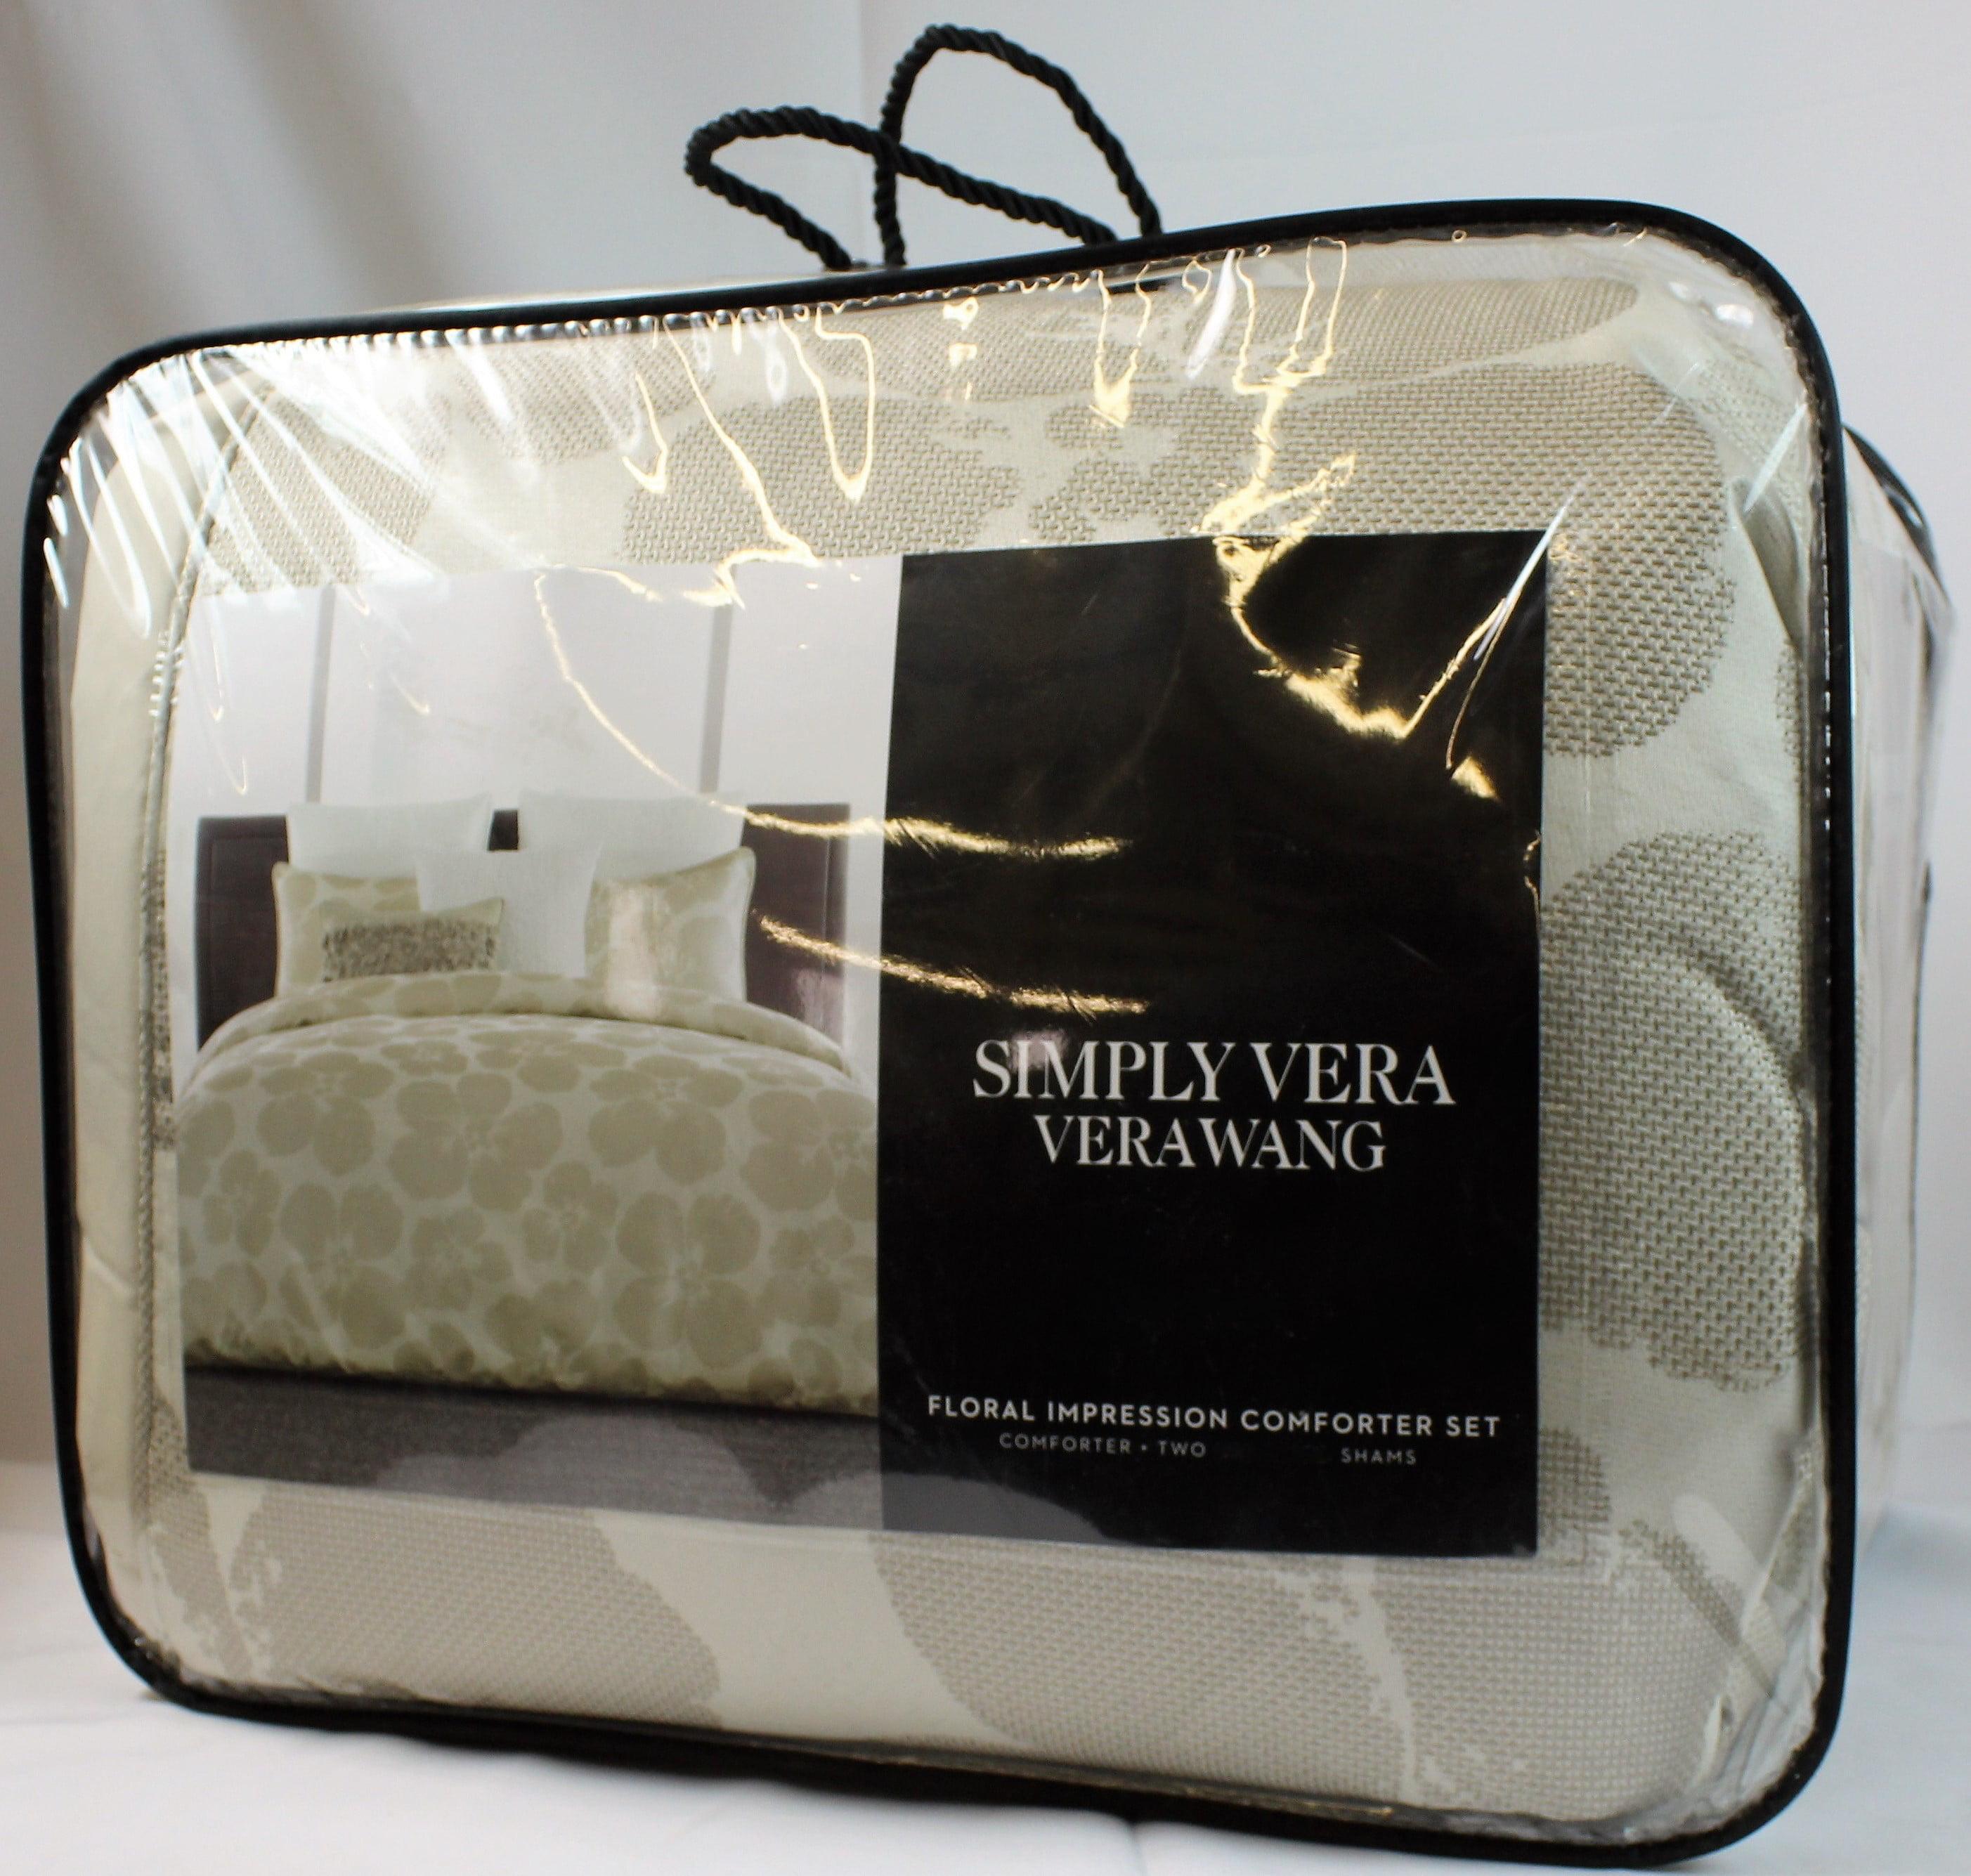 Simply Vera Vera Wang (Queen Floral impression comforter set)